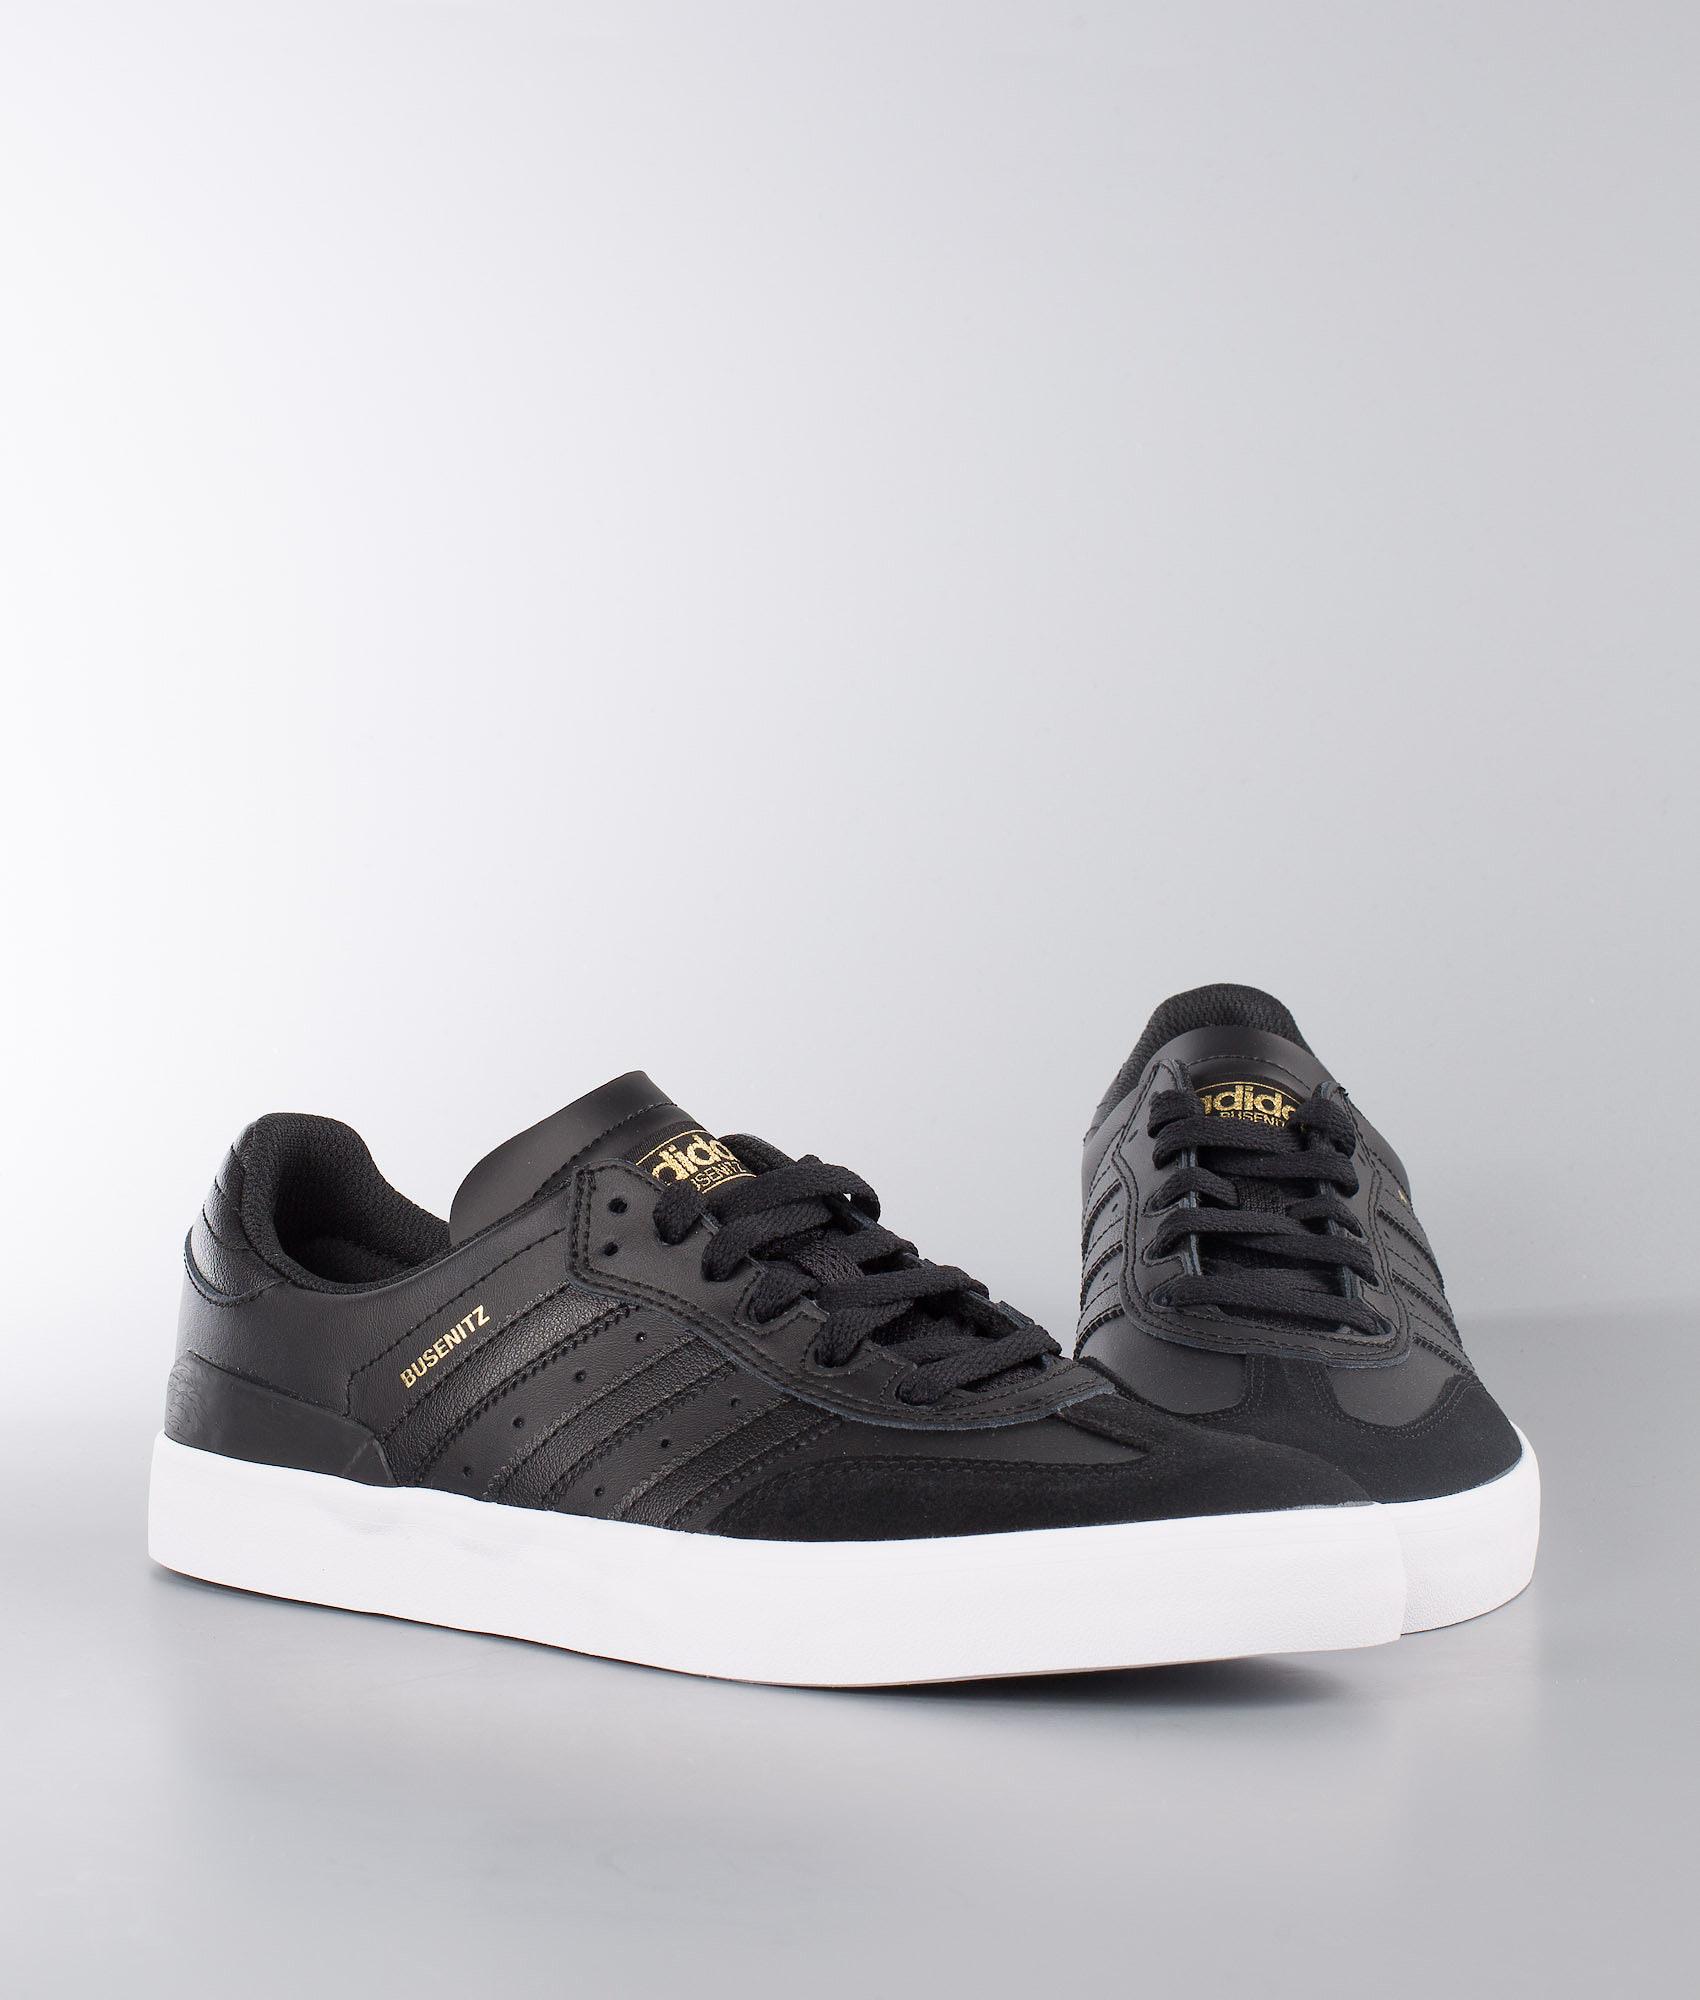 huge selection of 0624f f12b8 Adidas Skateboarding Busenitz Vulc Rx Shoes